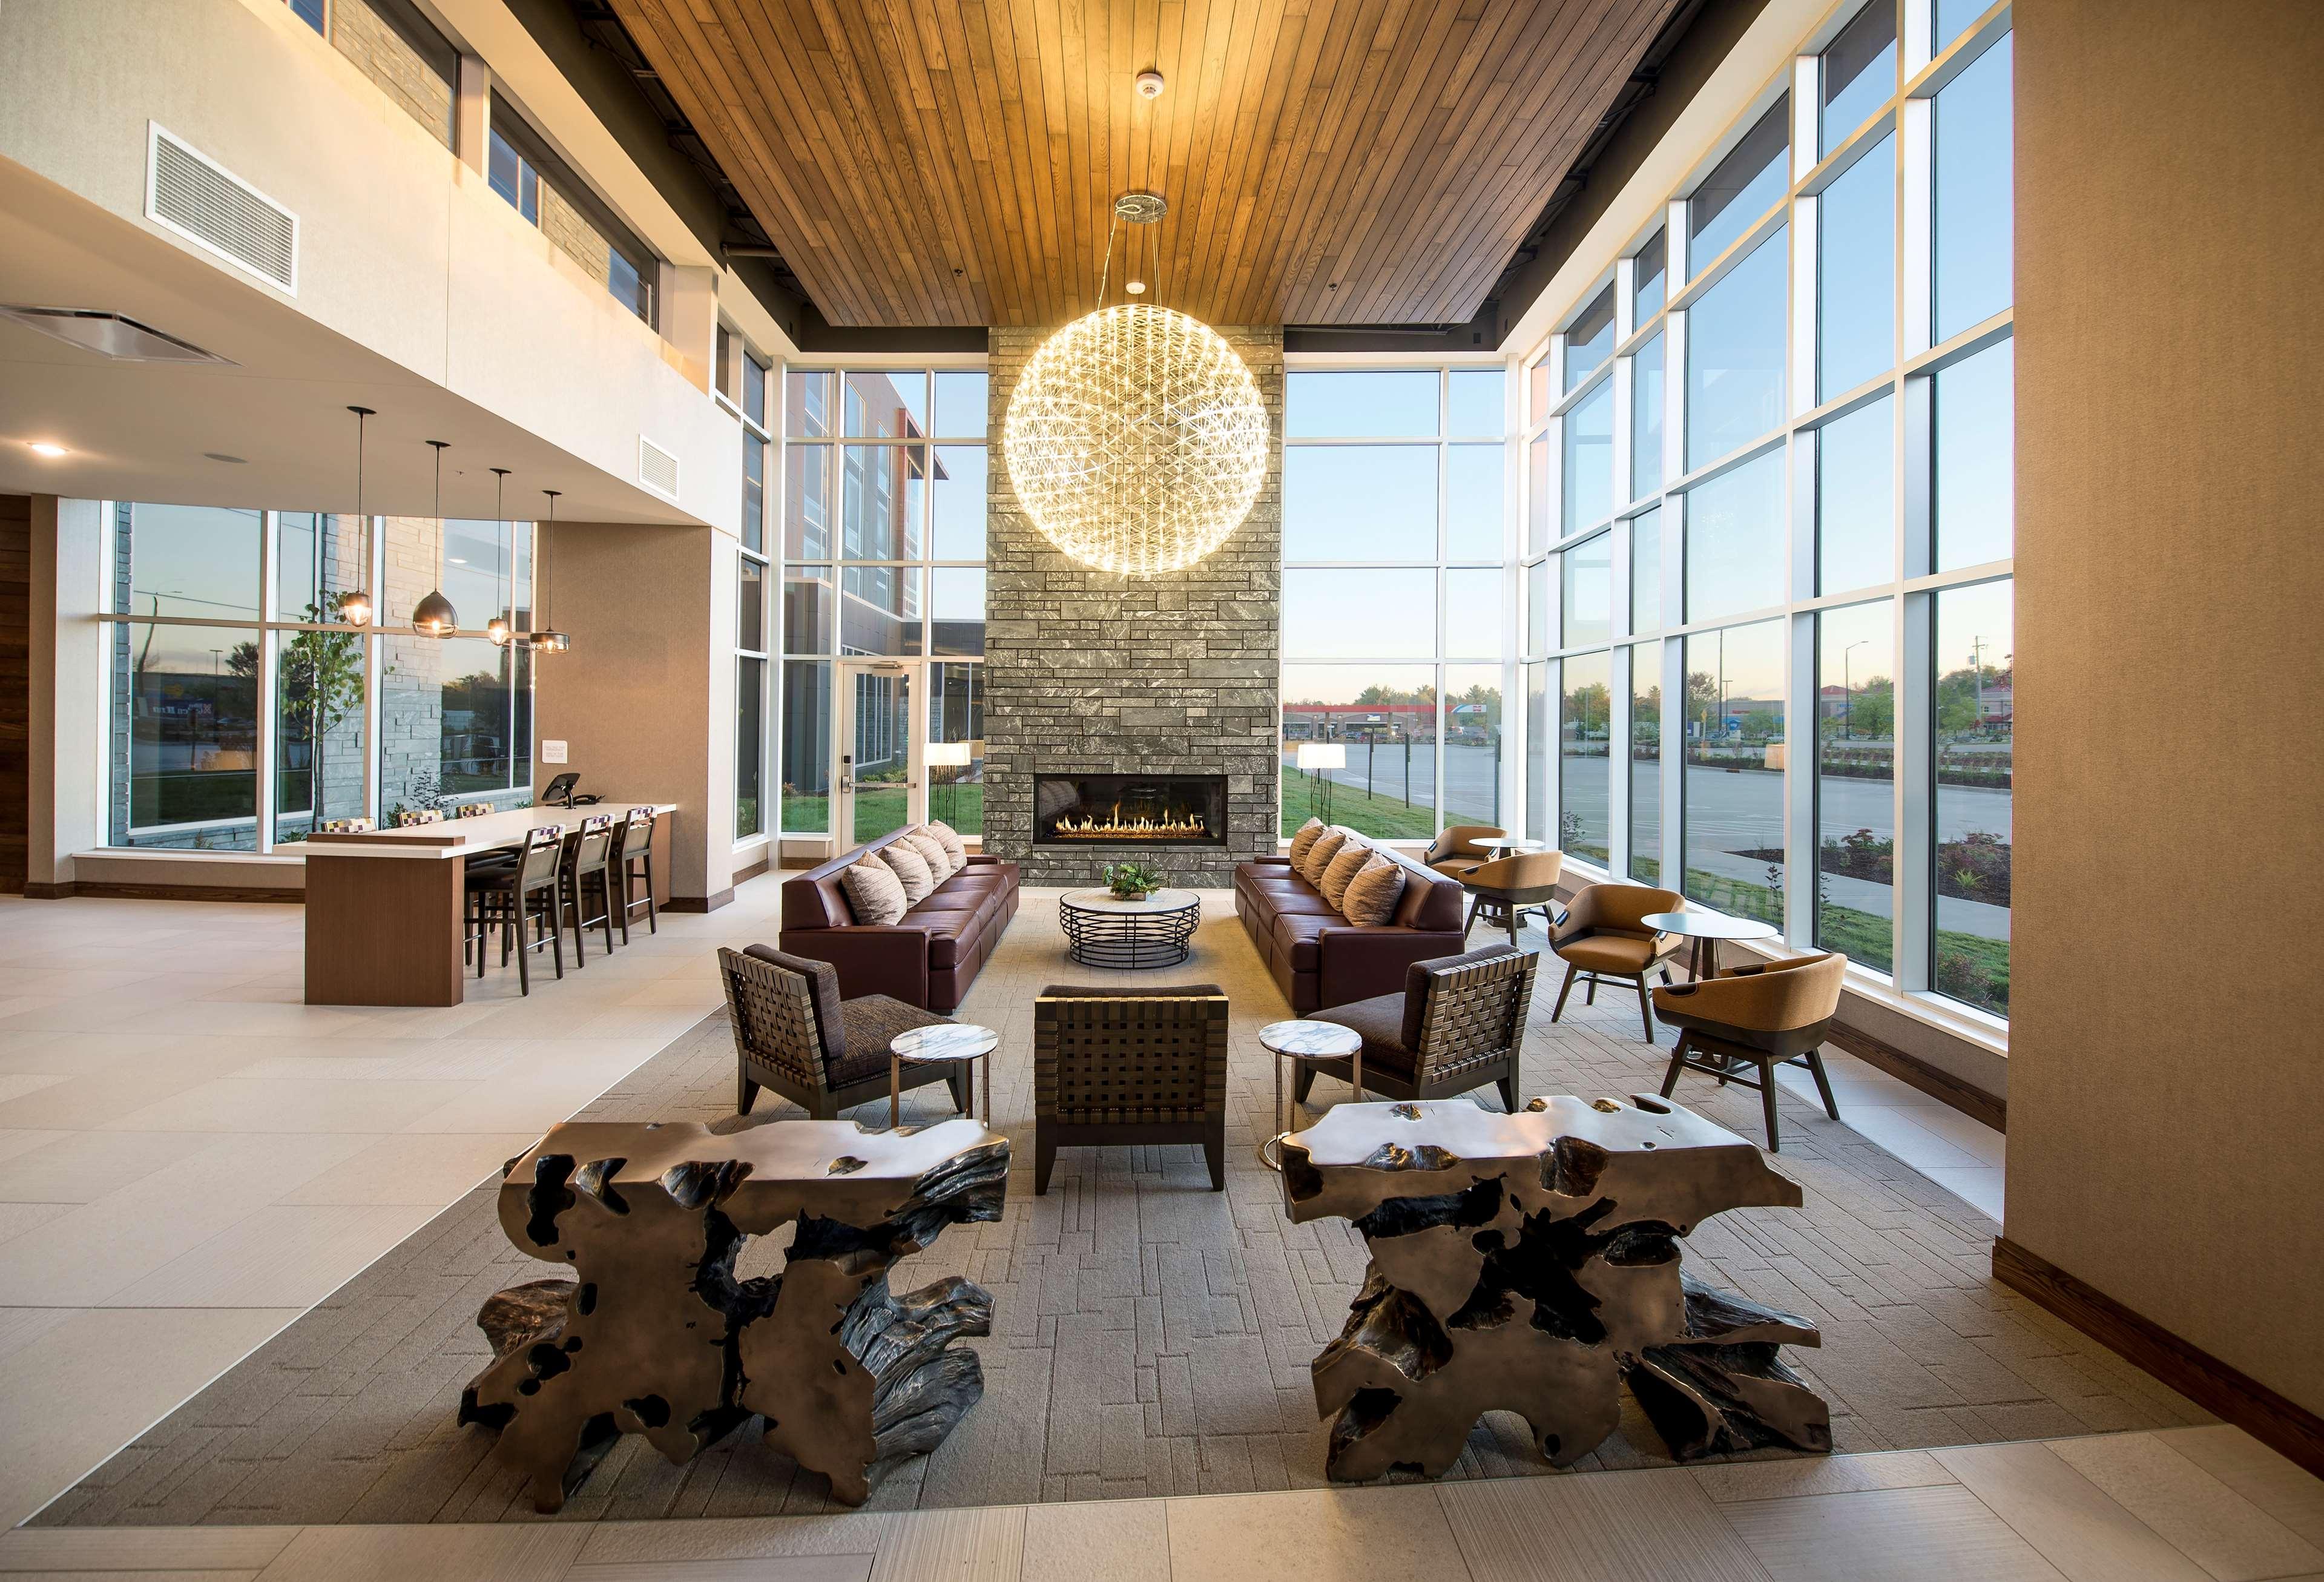 Hilton Garden Inn Wausau image 3